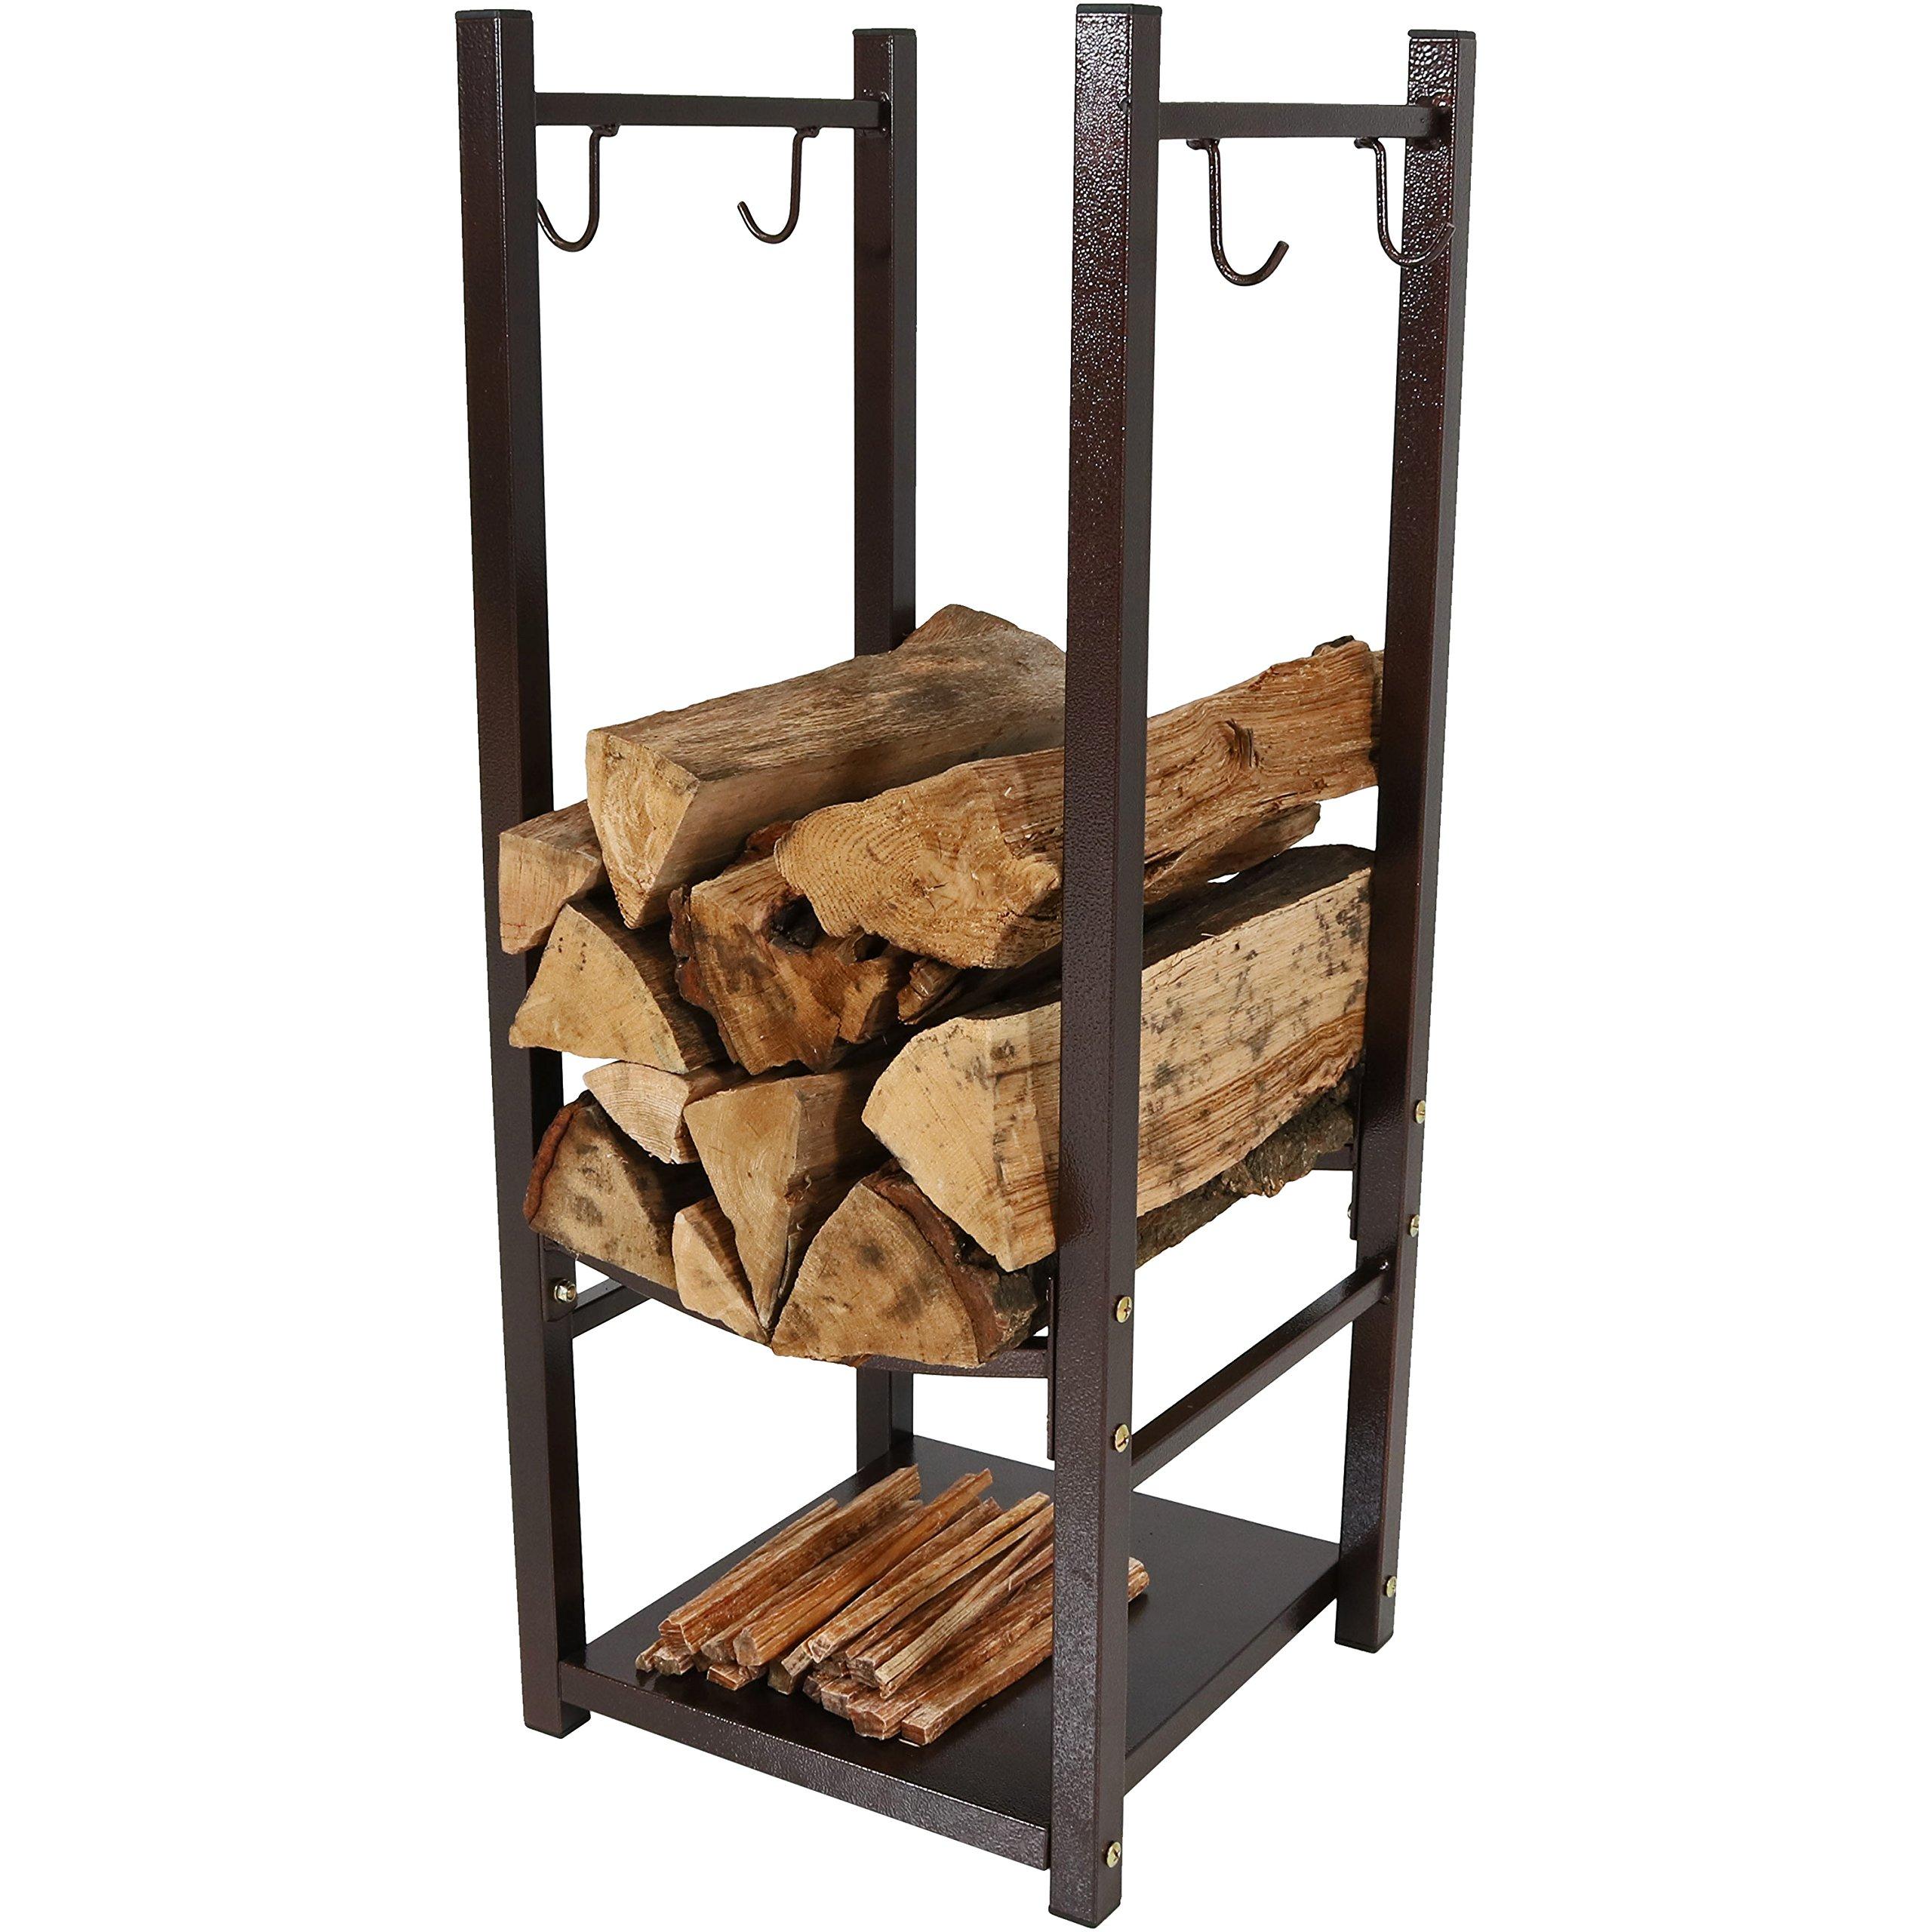 Sunnydaze Firewood Log Rack with Tool Holders, Indoor or Outdoor Wood Storage, Bronze